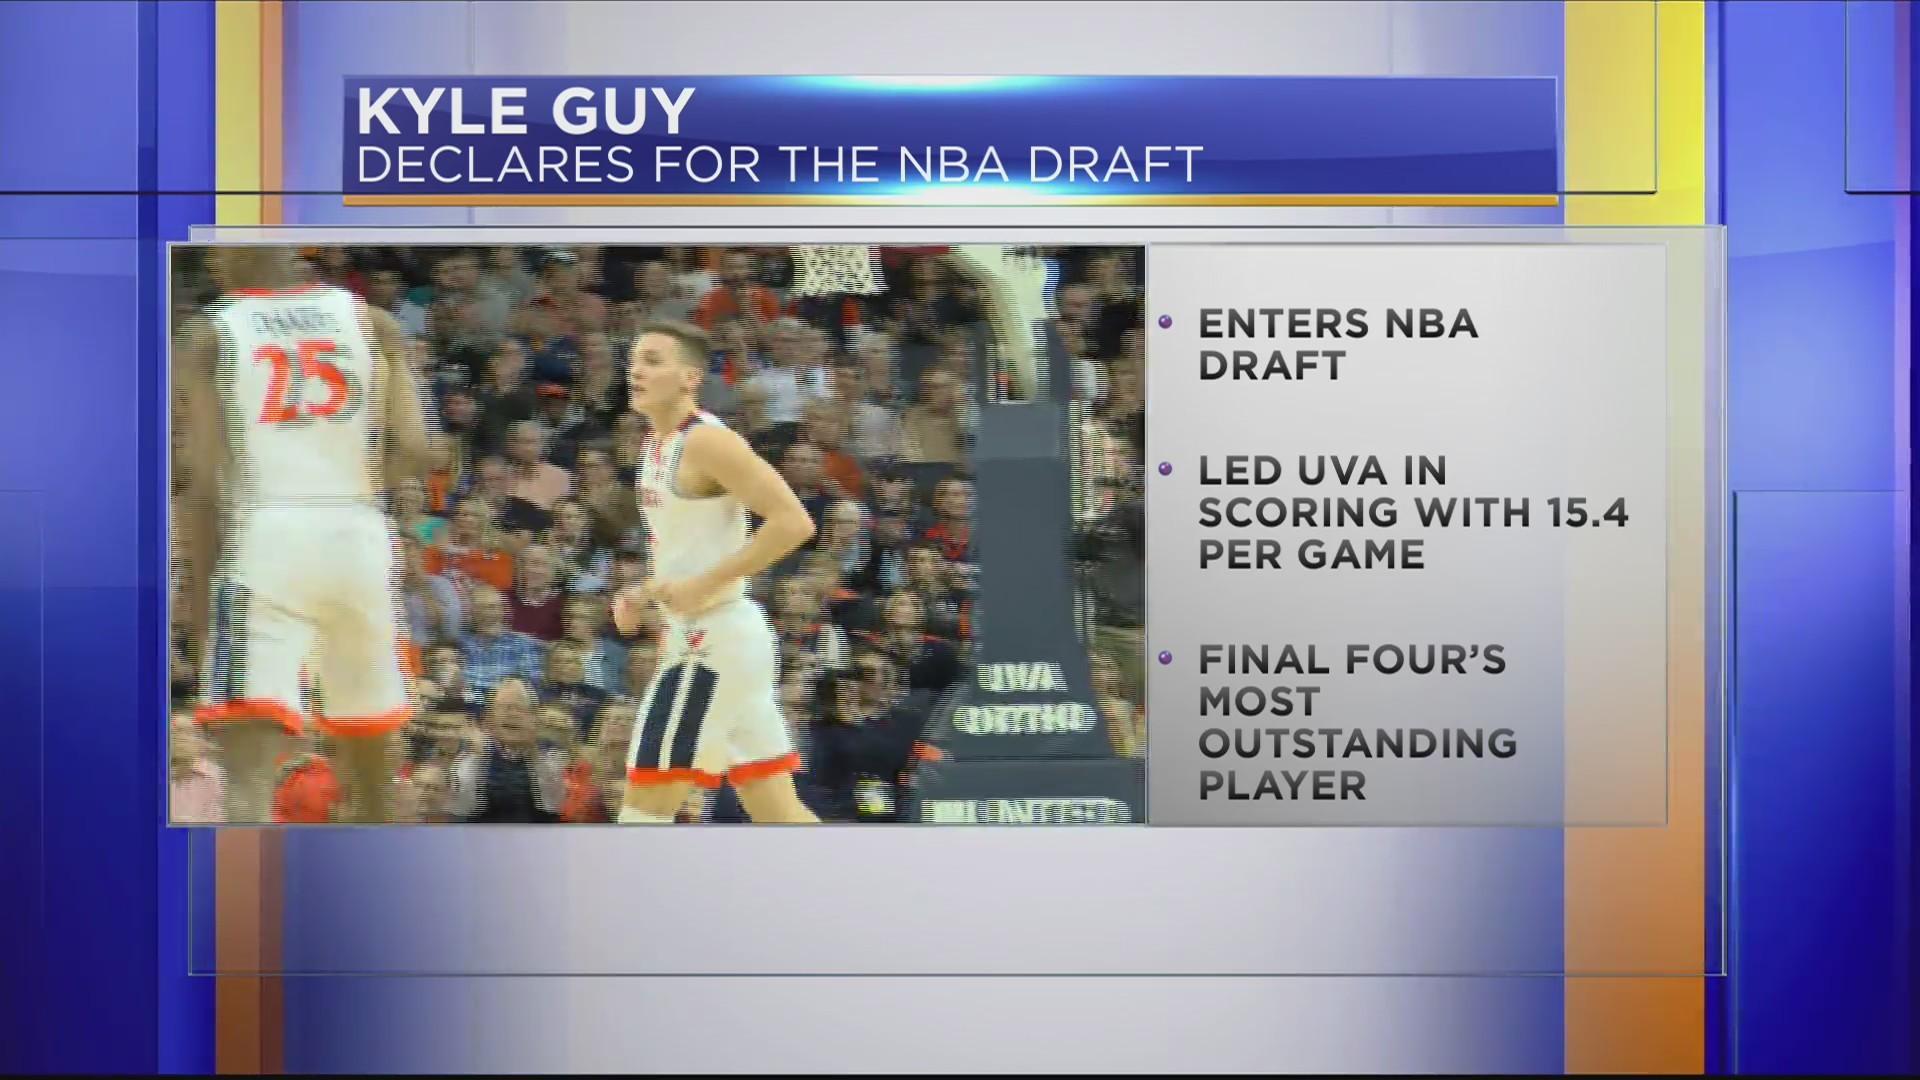 UVA's Kyle Guy to enter NBA Draft